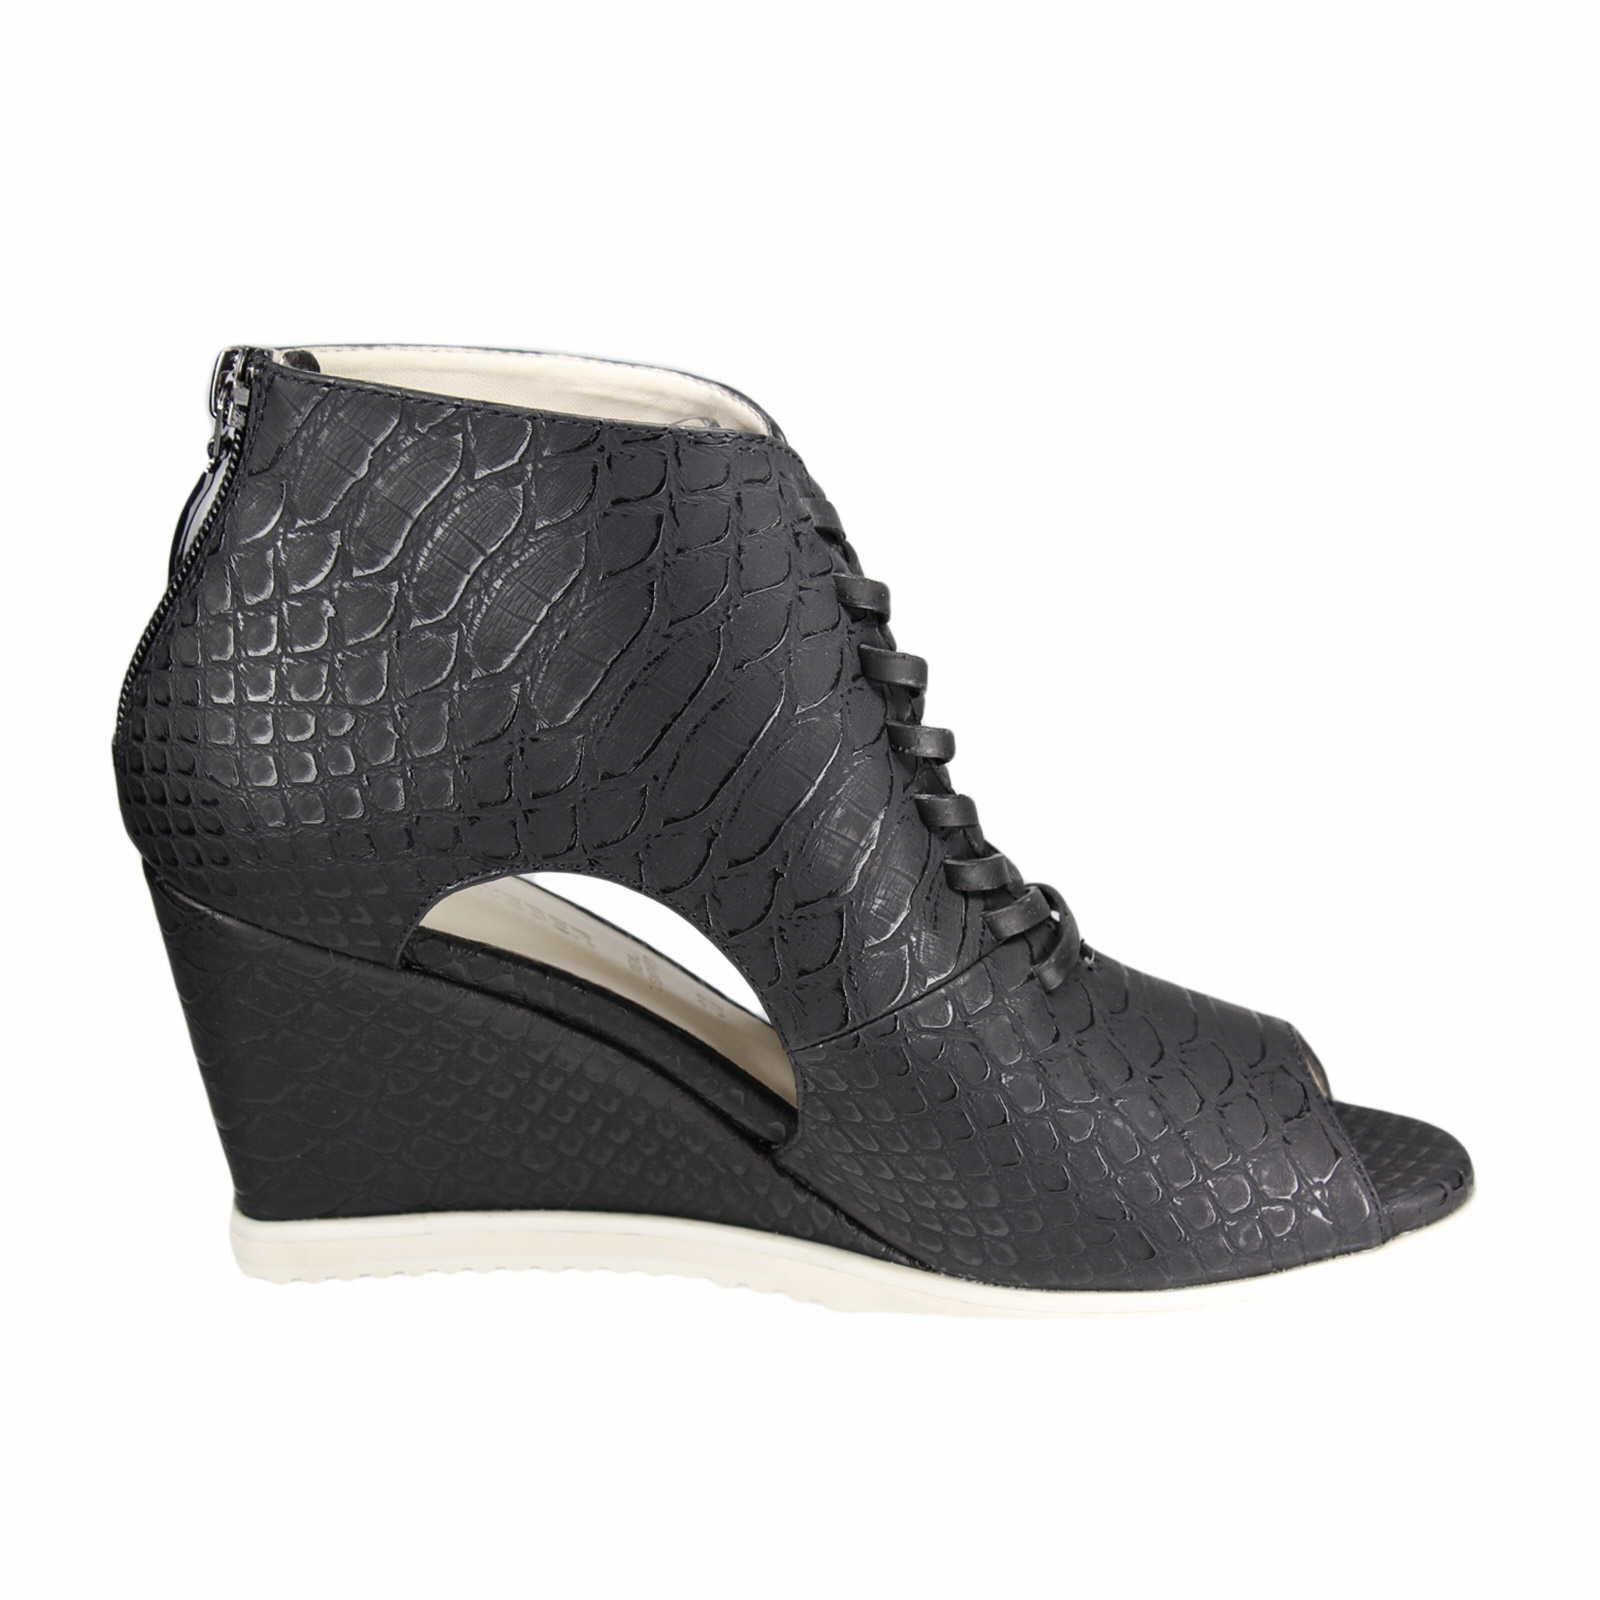 gerry weber shoes schwarz adriana 02 g26802 832 100 schuhparadies online shop schuhe. Black Bedroom Furniture Sets. Home Design Ideas